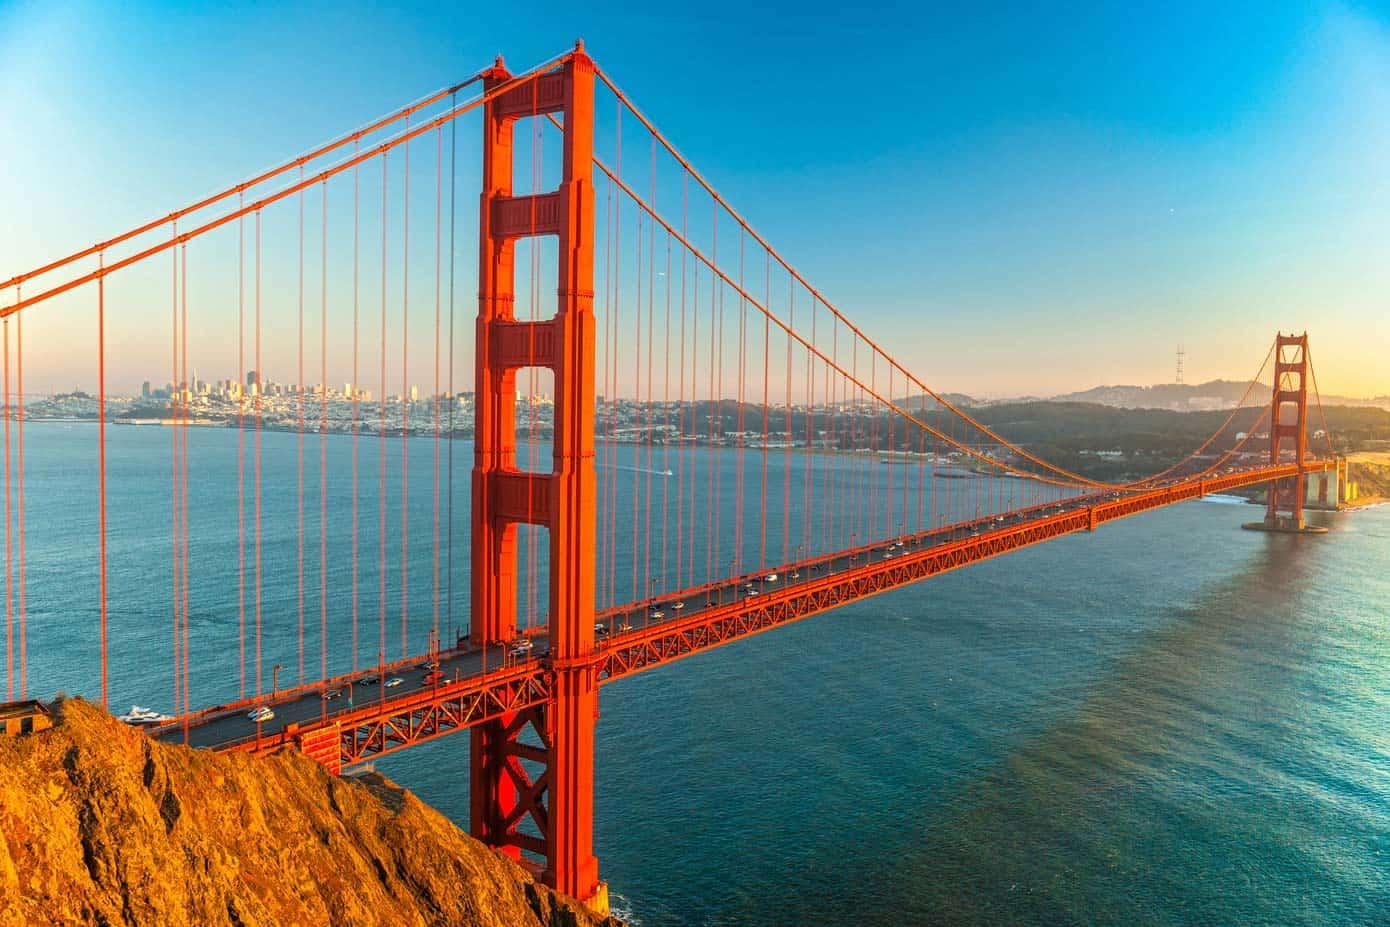 The Golden Gate bridge during sunset over San Francisco, California.